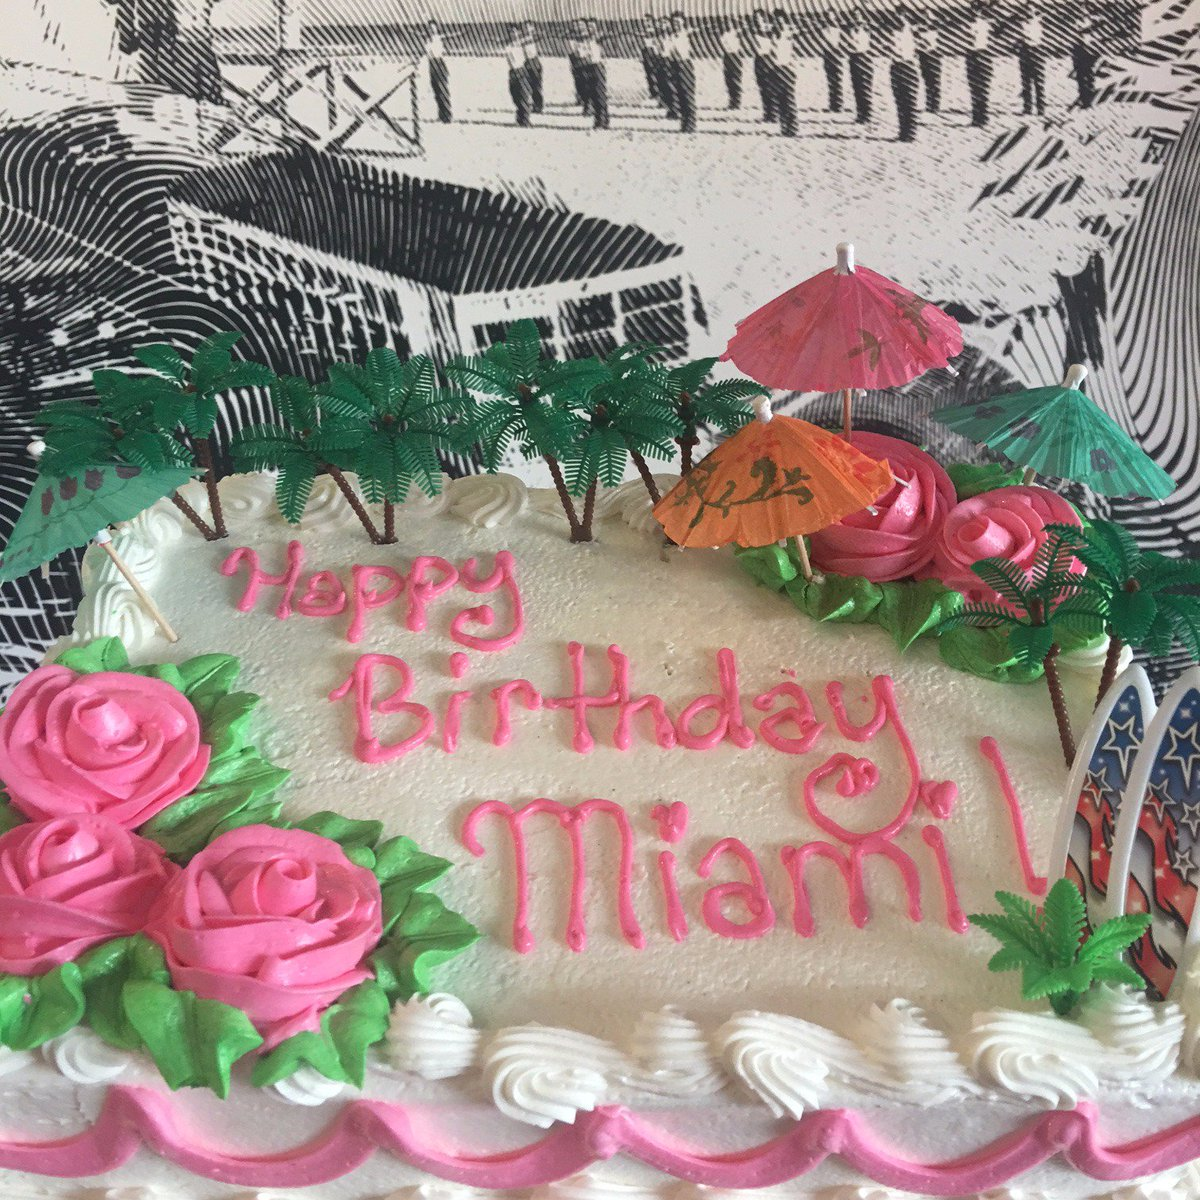 Happy BDAY, Miami! In honor of Miami's founder, Julia Tuttle, all women receive FREE admission today @HistoryMiami https://t.co/Fq6YQTVOX1